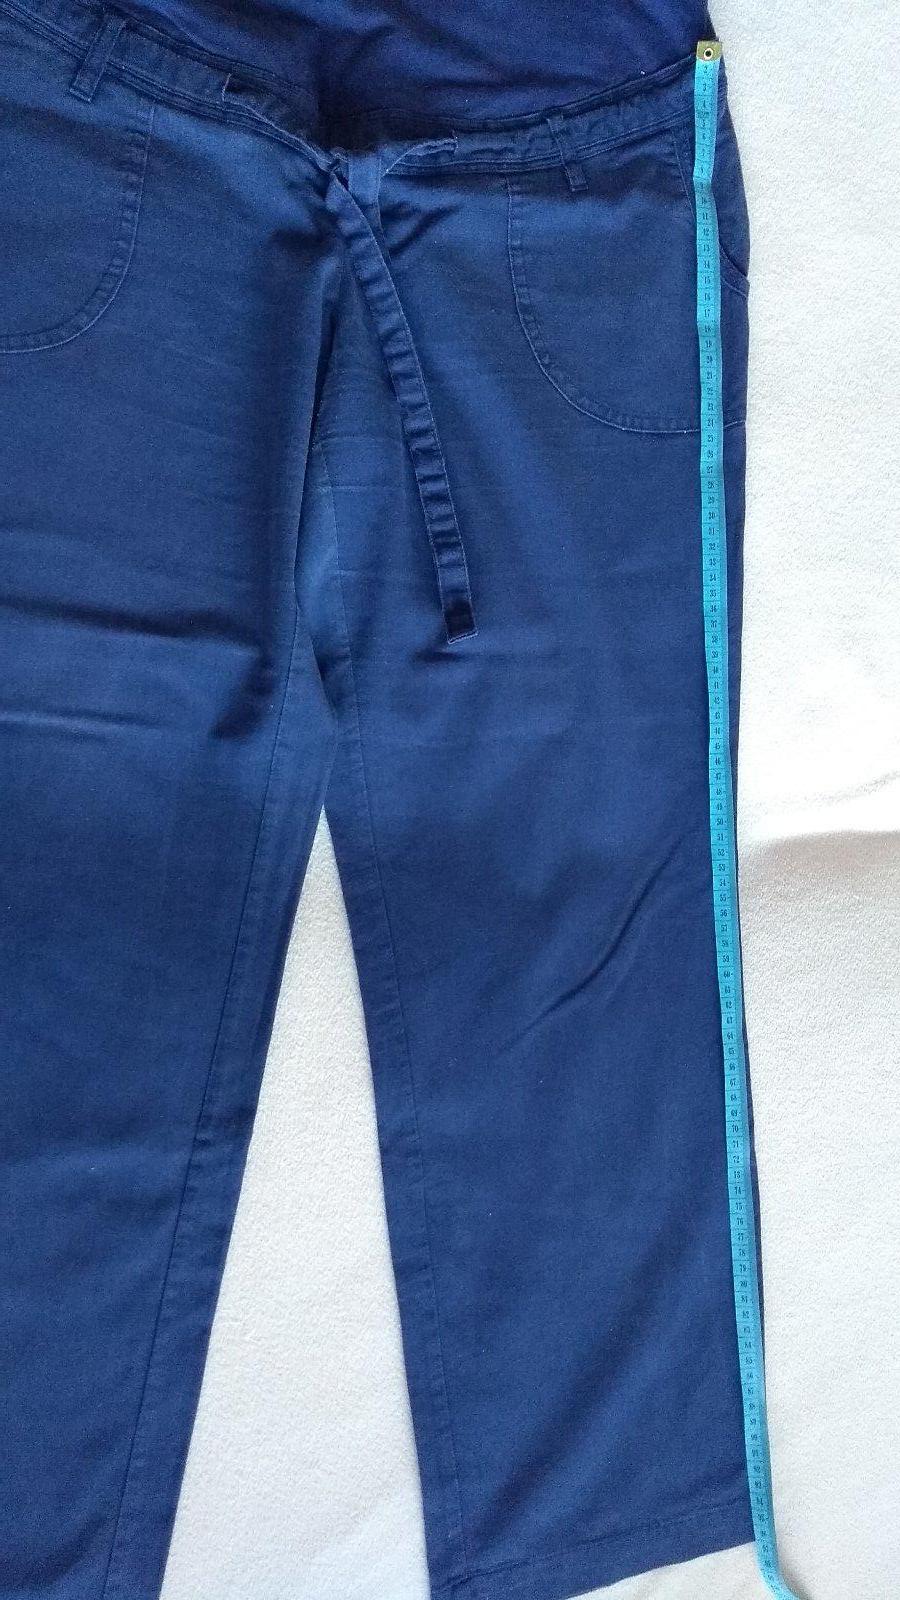 374ea27cc7e3 Modré ľanové tehu nohavice bonprix